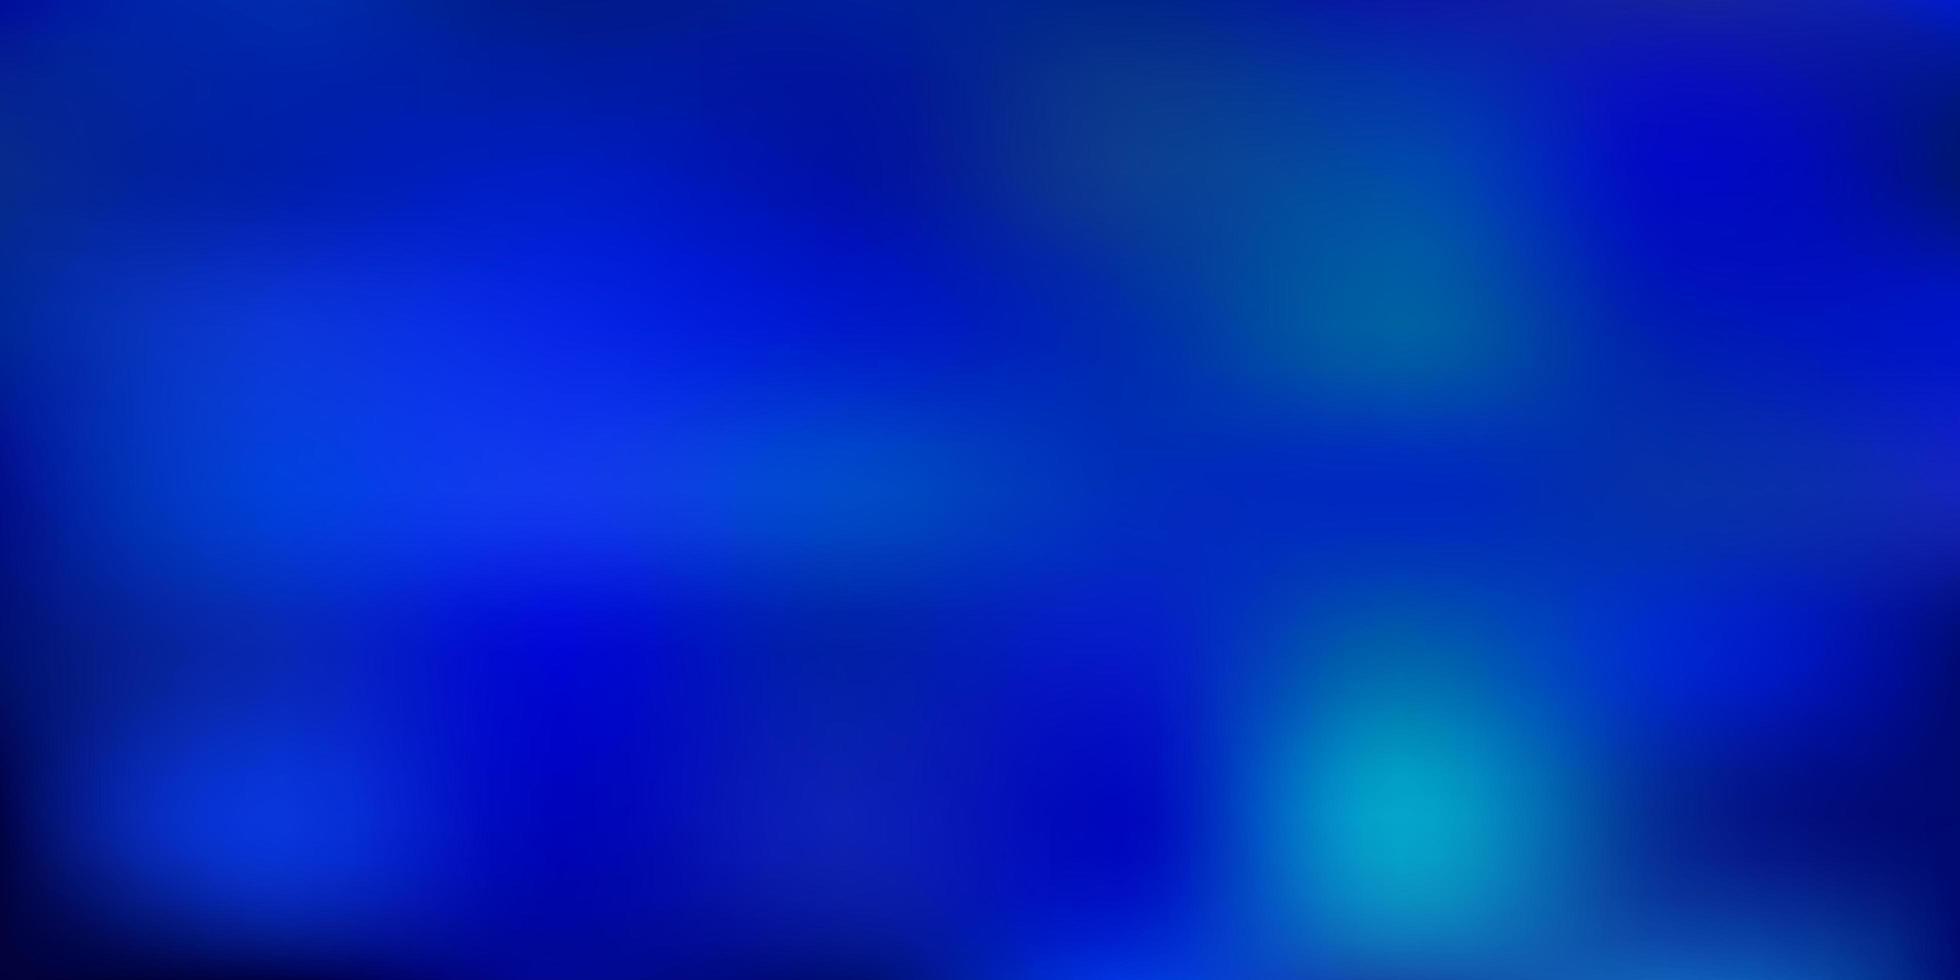 diseño de desenfoque abstracto azul claro. vector